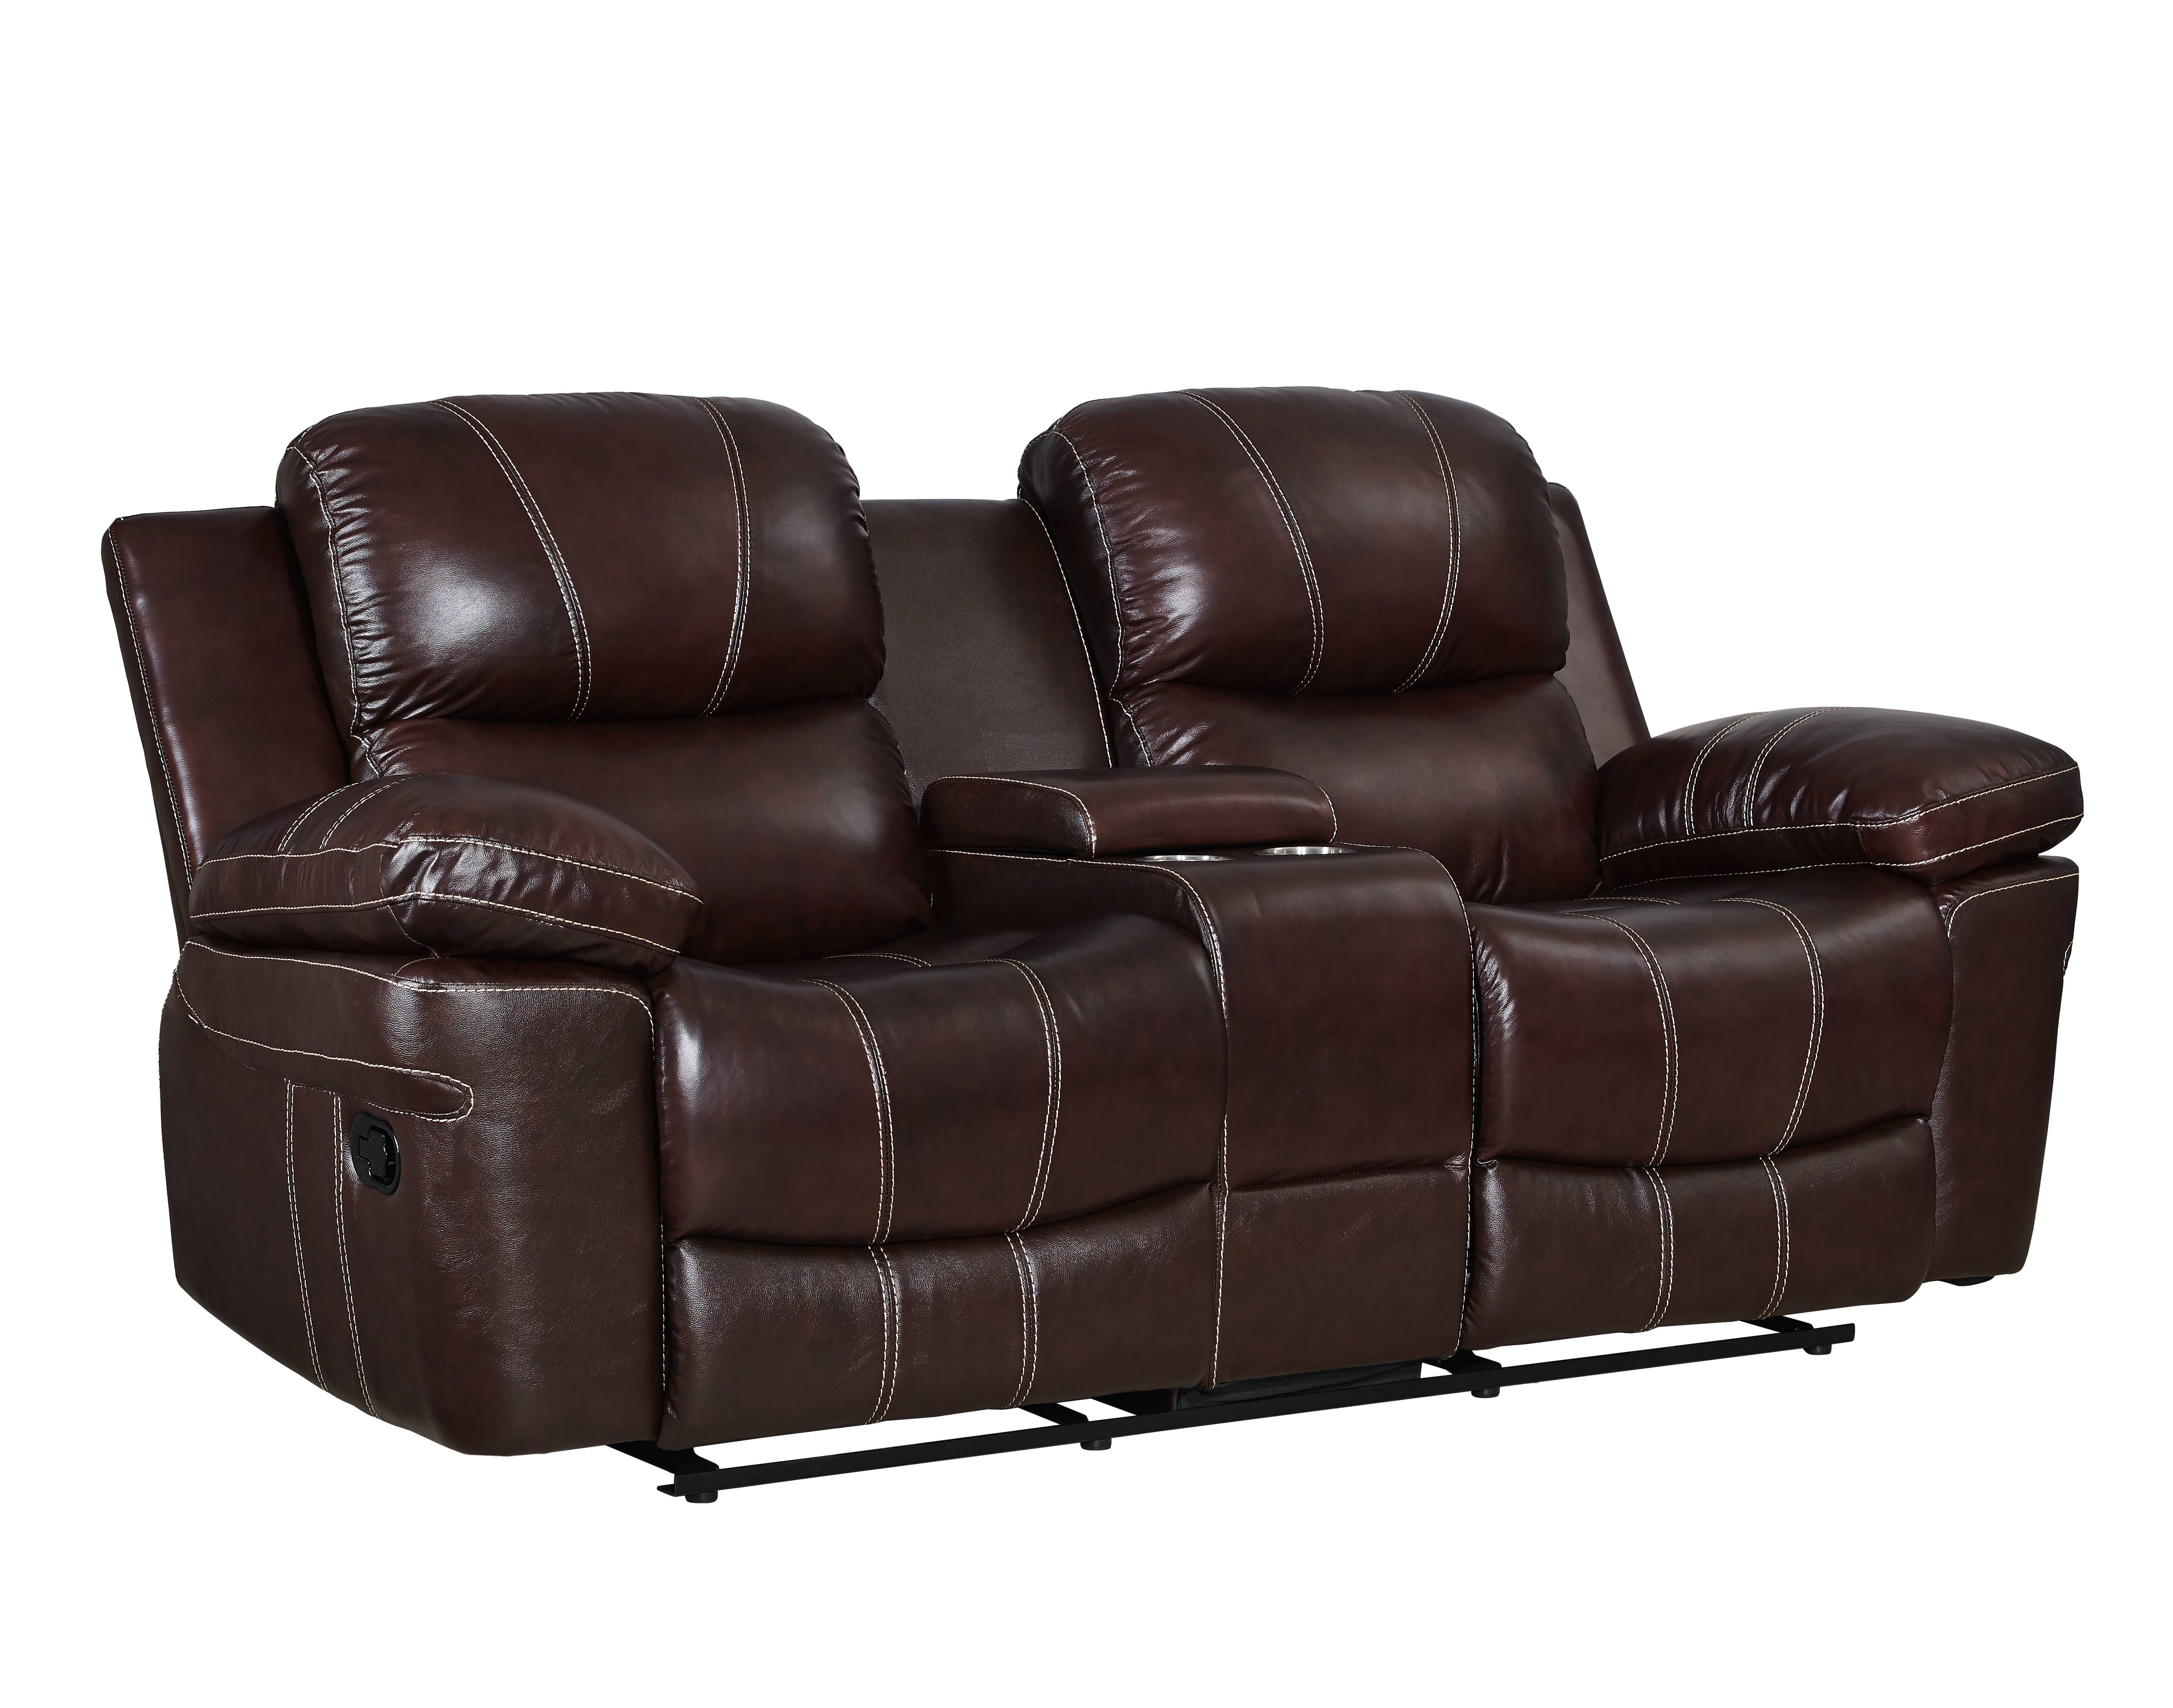 Legato Dark Brown Grain Leather Match Power Recliner Console Loveseat Love Seat New Classic Furniture Recliner